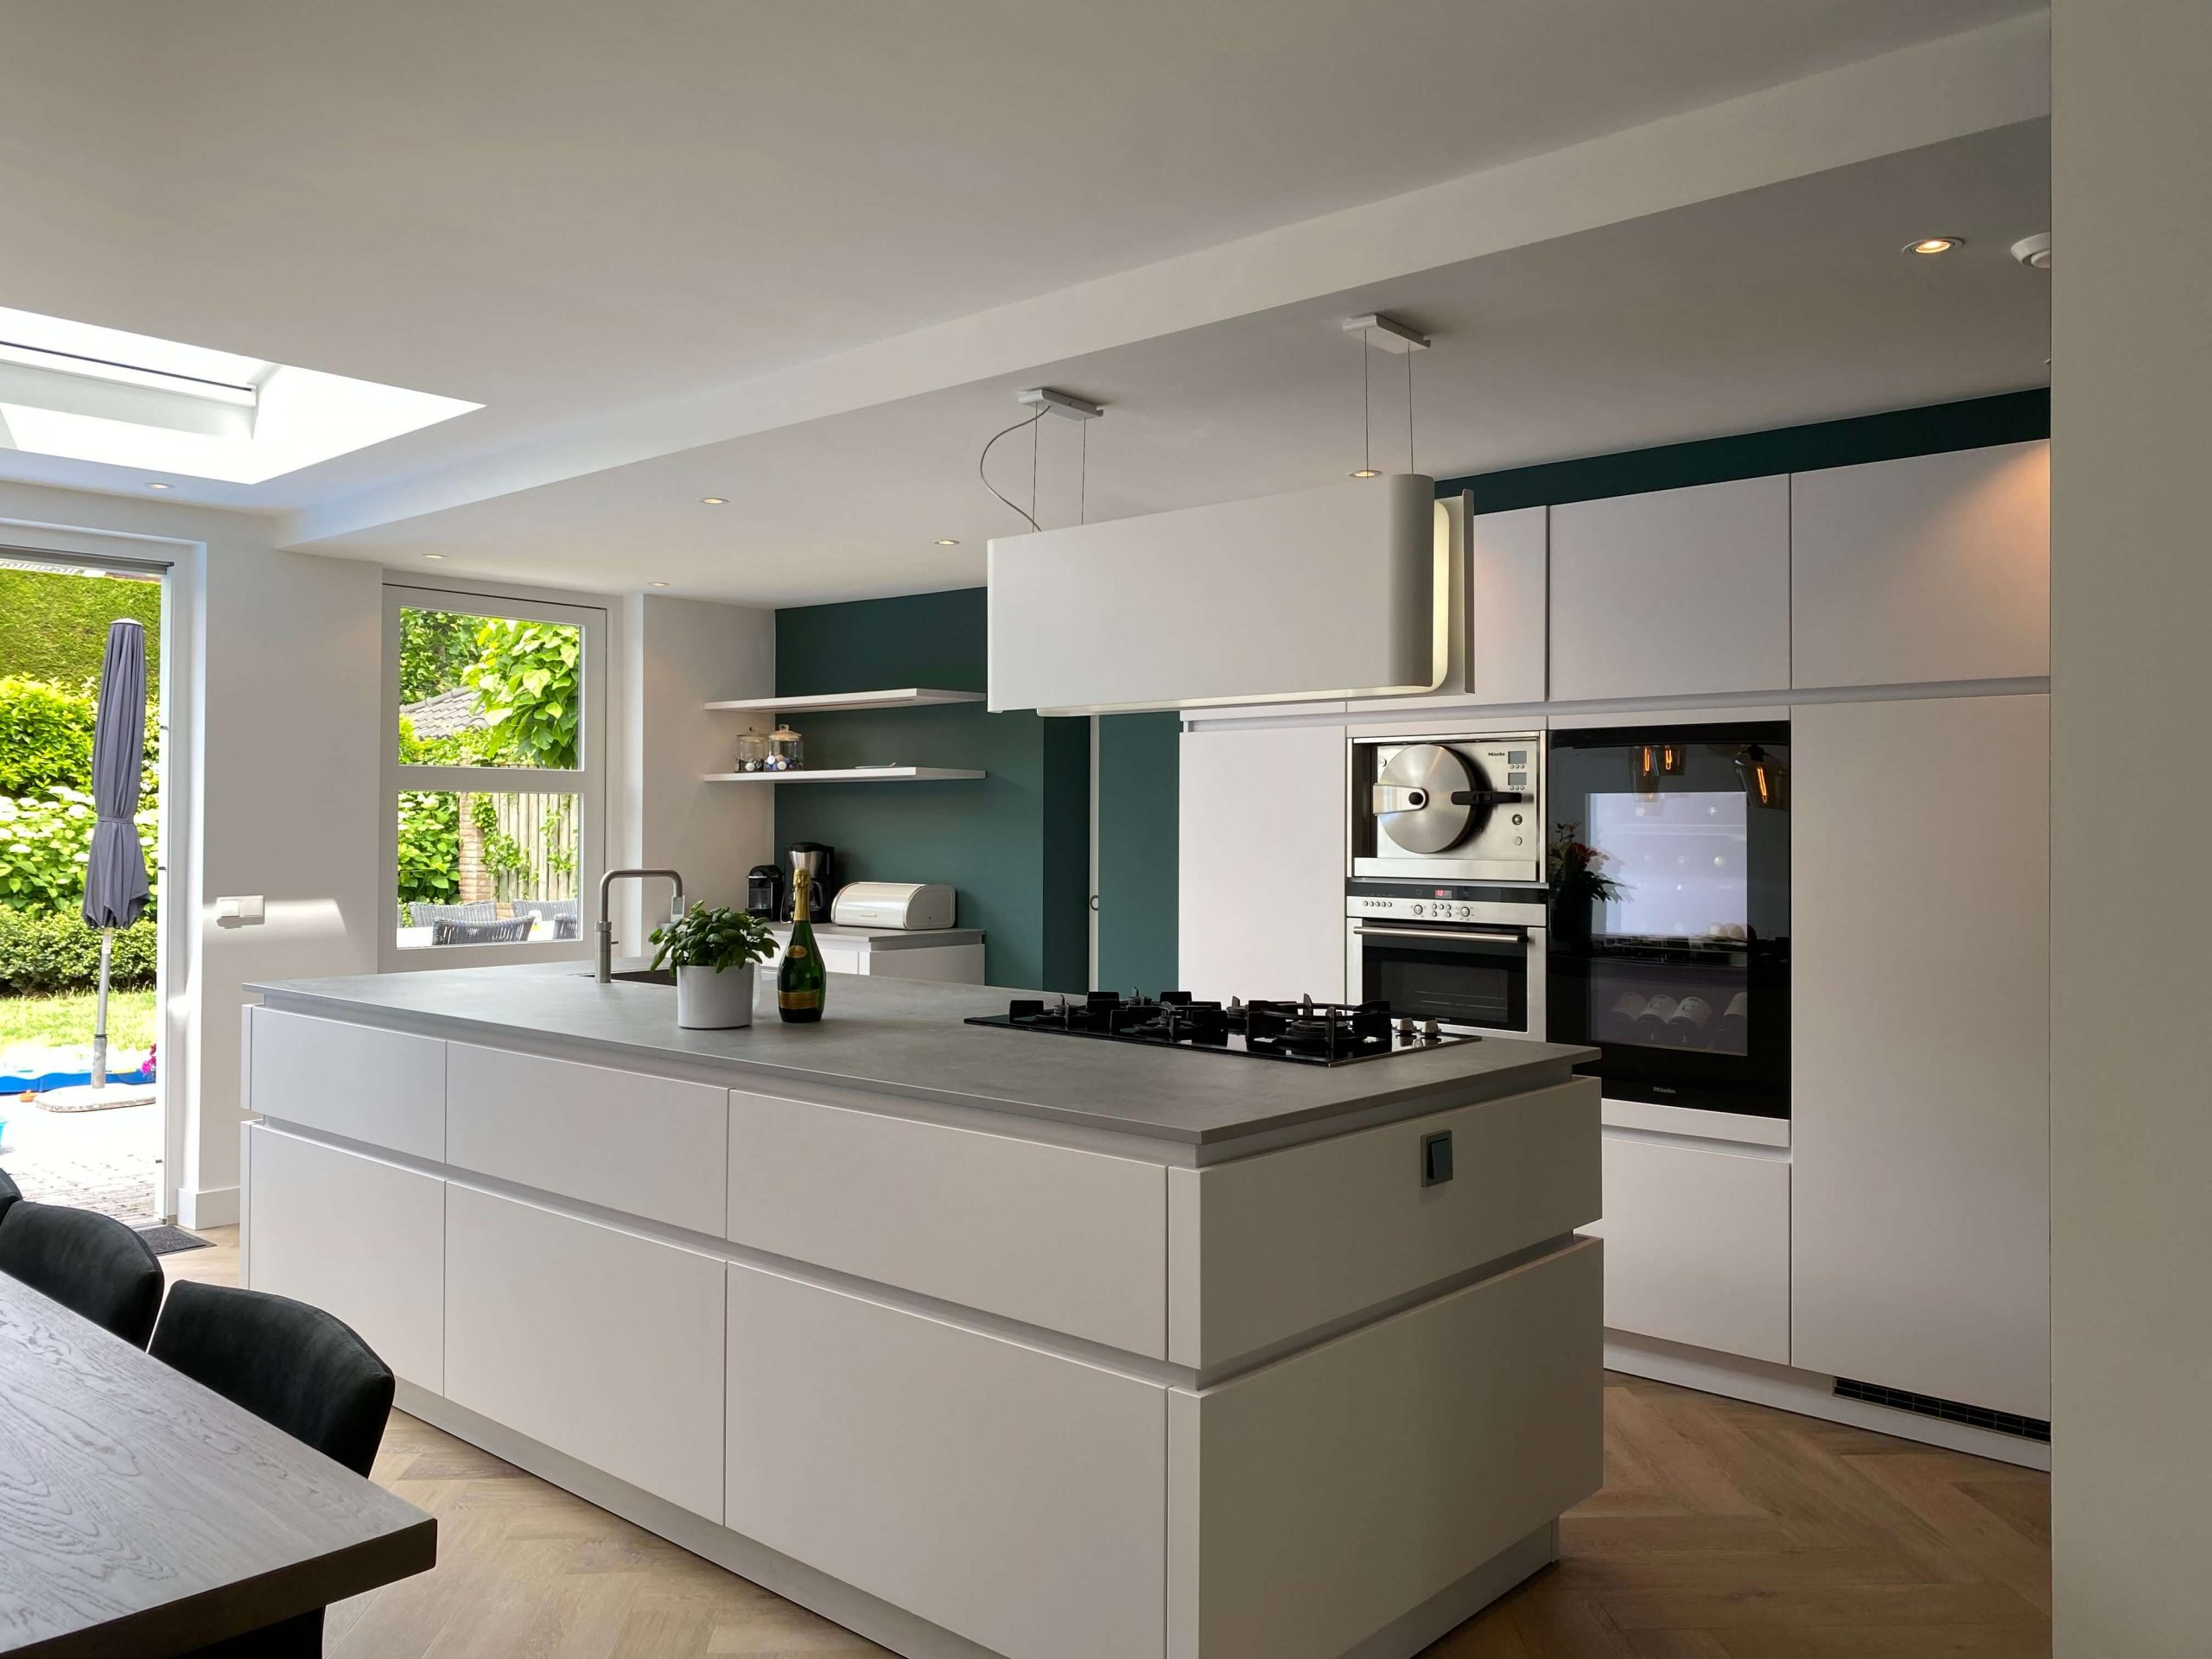 greeploze witte designkeuken in ruimte keukenuitbouw